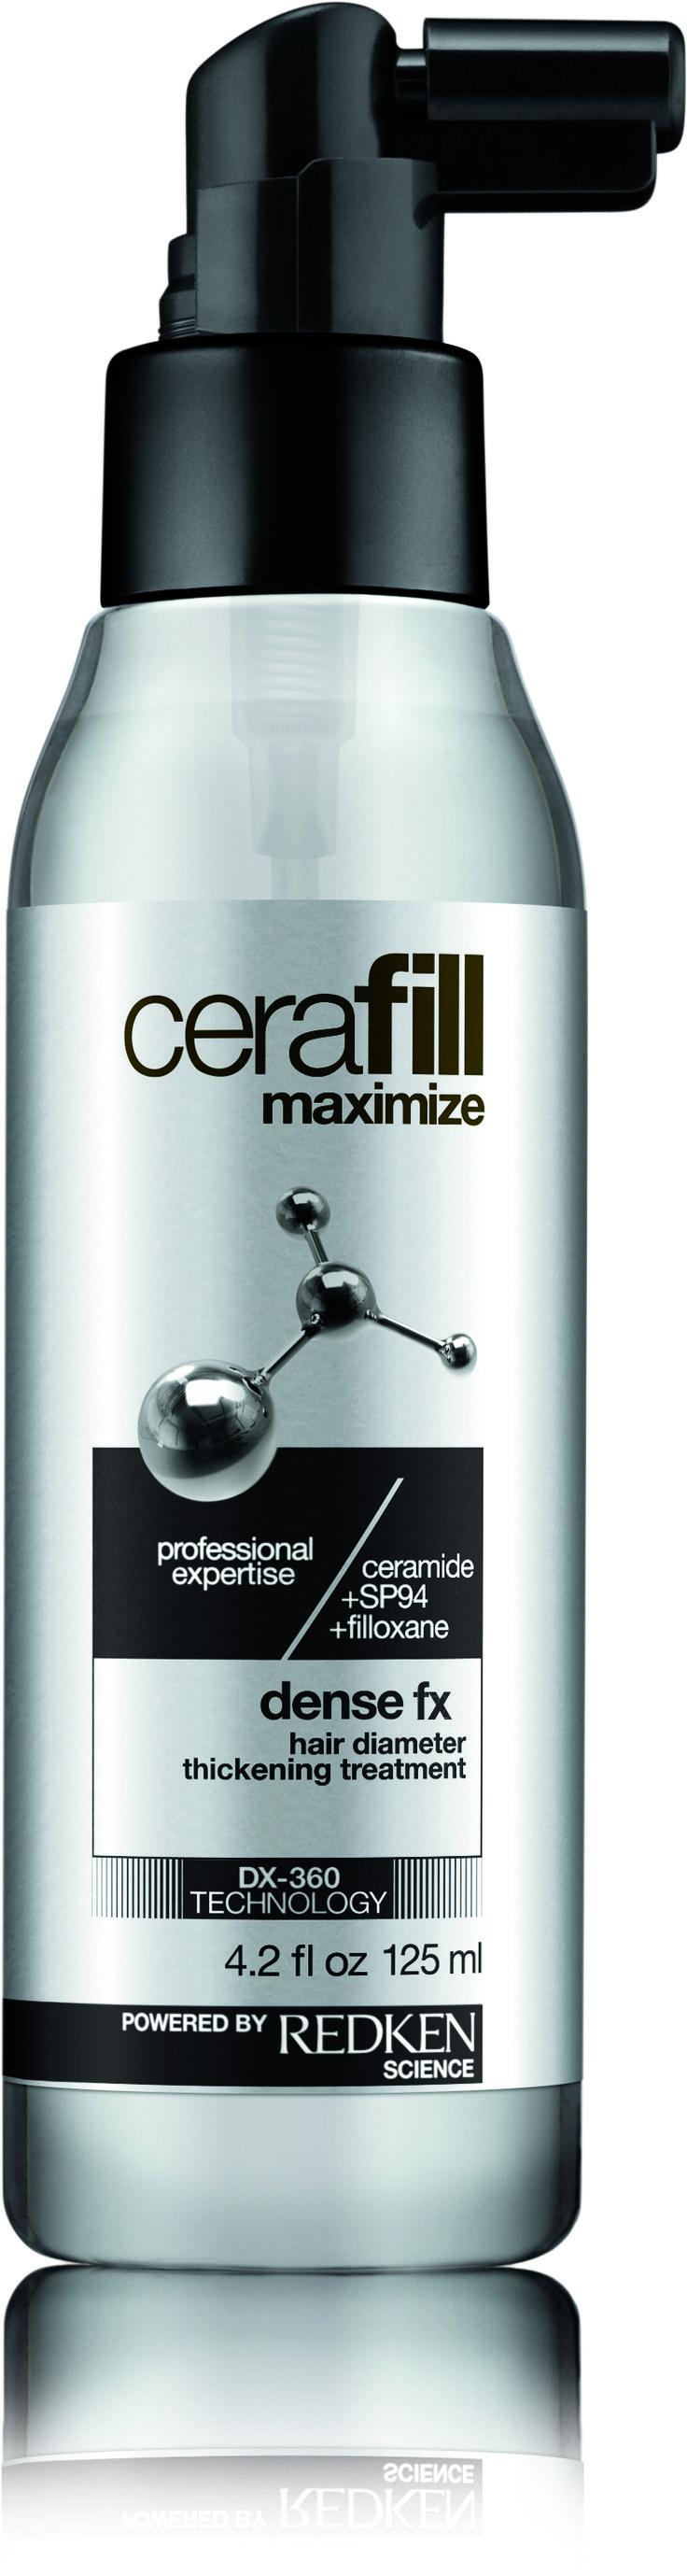 Redken Science cerafill maximize dense fx hair diameter thickening treatment 125ml.